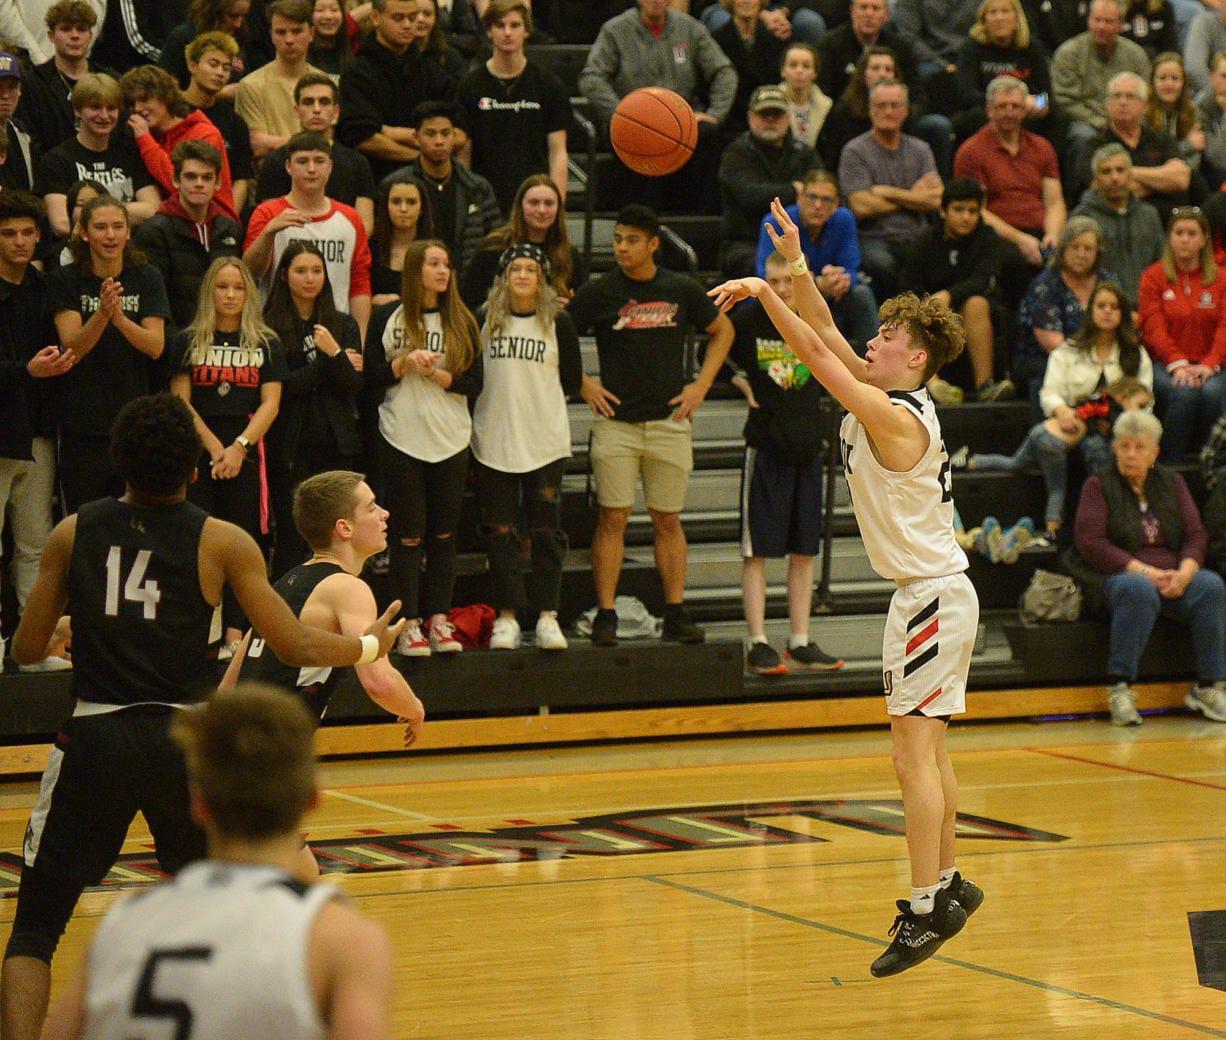 Union junior Kaden Horn shoots a deep three pointer against Kentlake at Union High School on Tuesday, January 21, 2020.